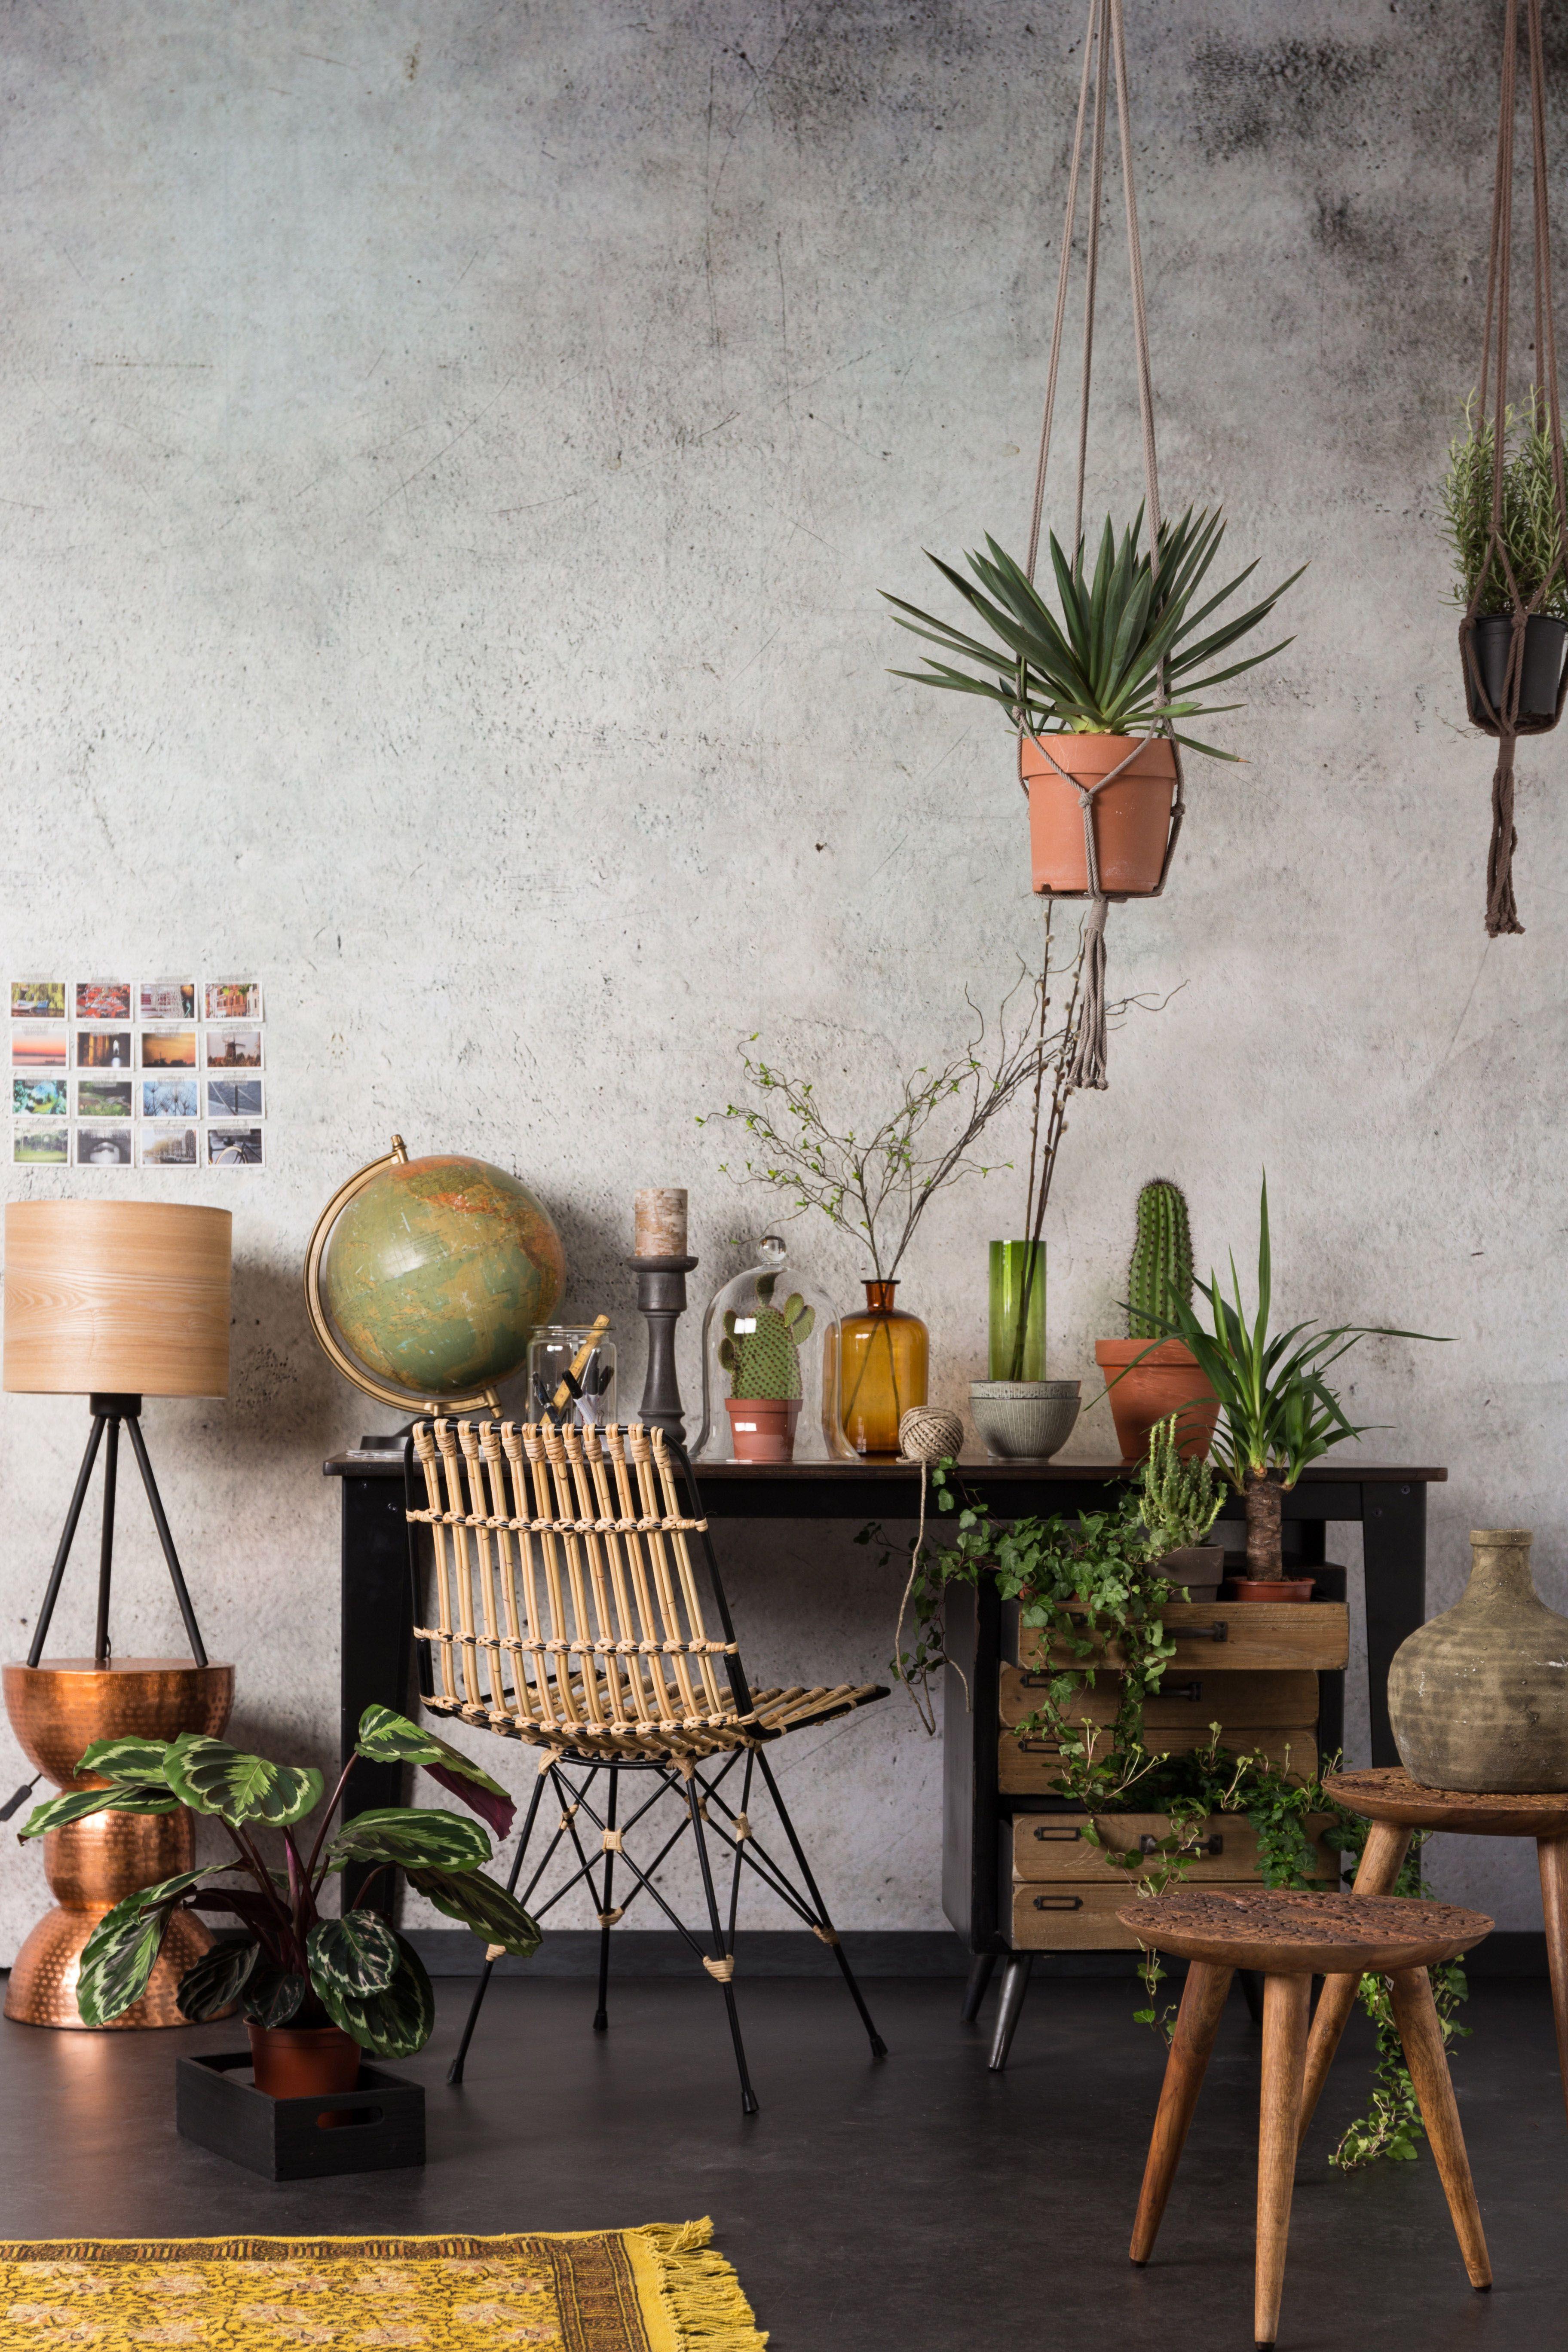 Rattan chairs, home-lust.com